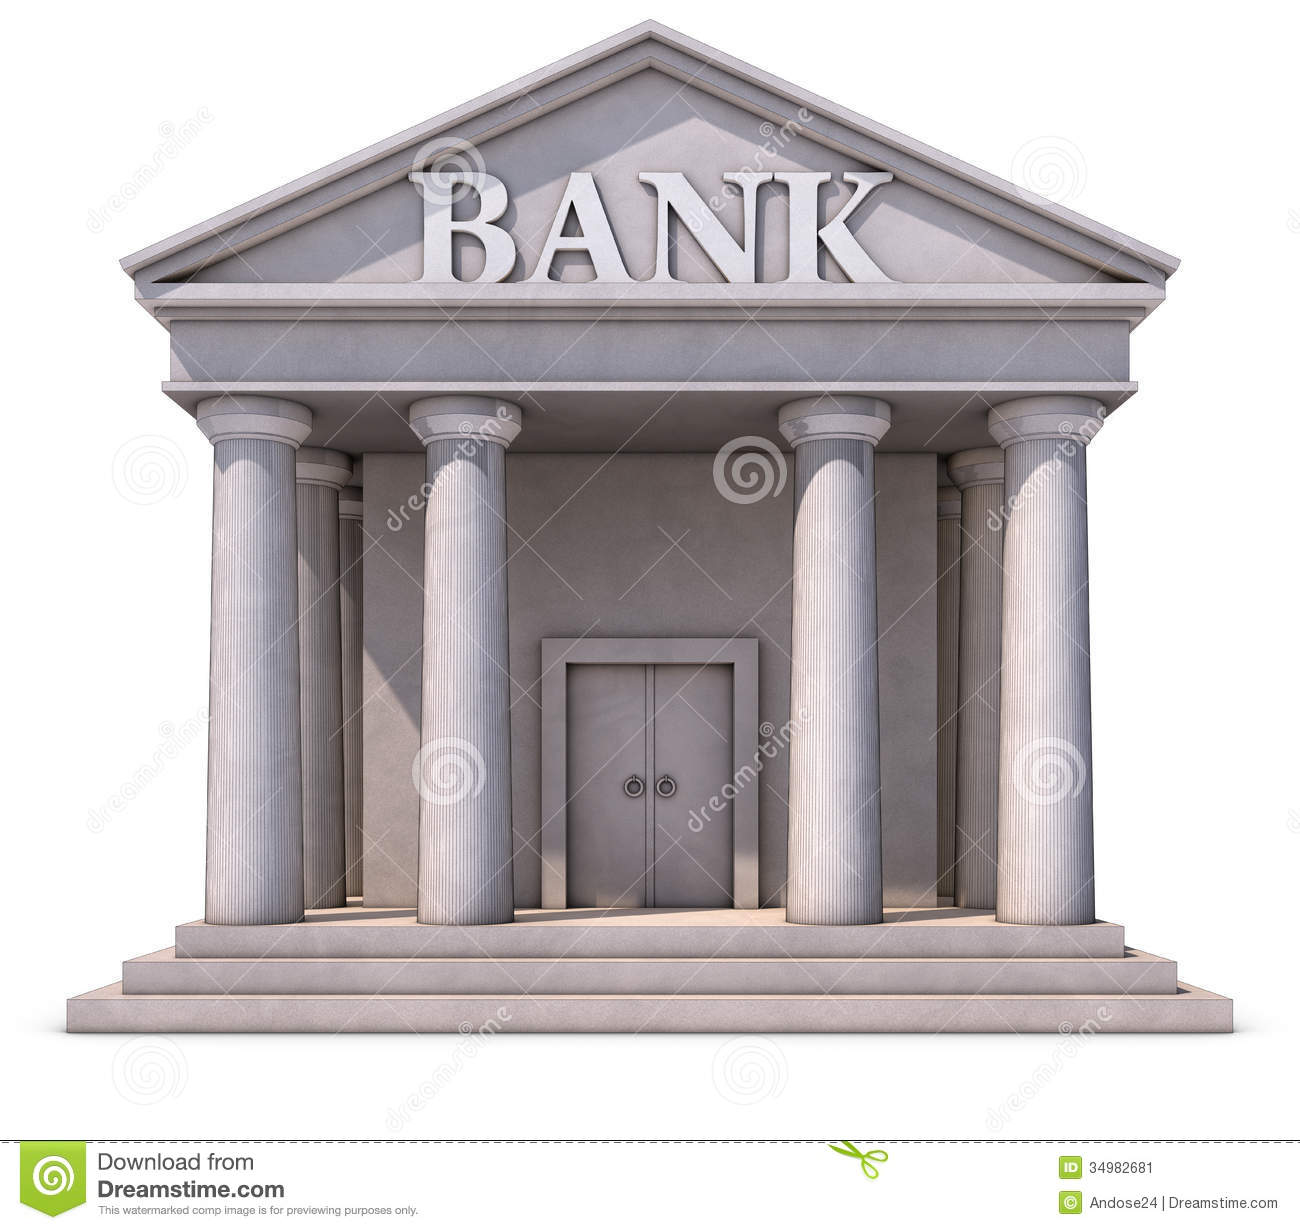 Clipart bank png royalty free stock Bank Building Clipart - Clipart Kid png royalty free stock